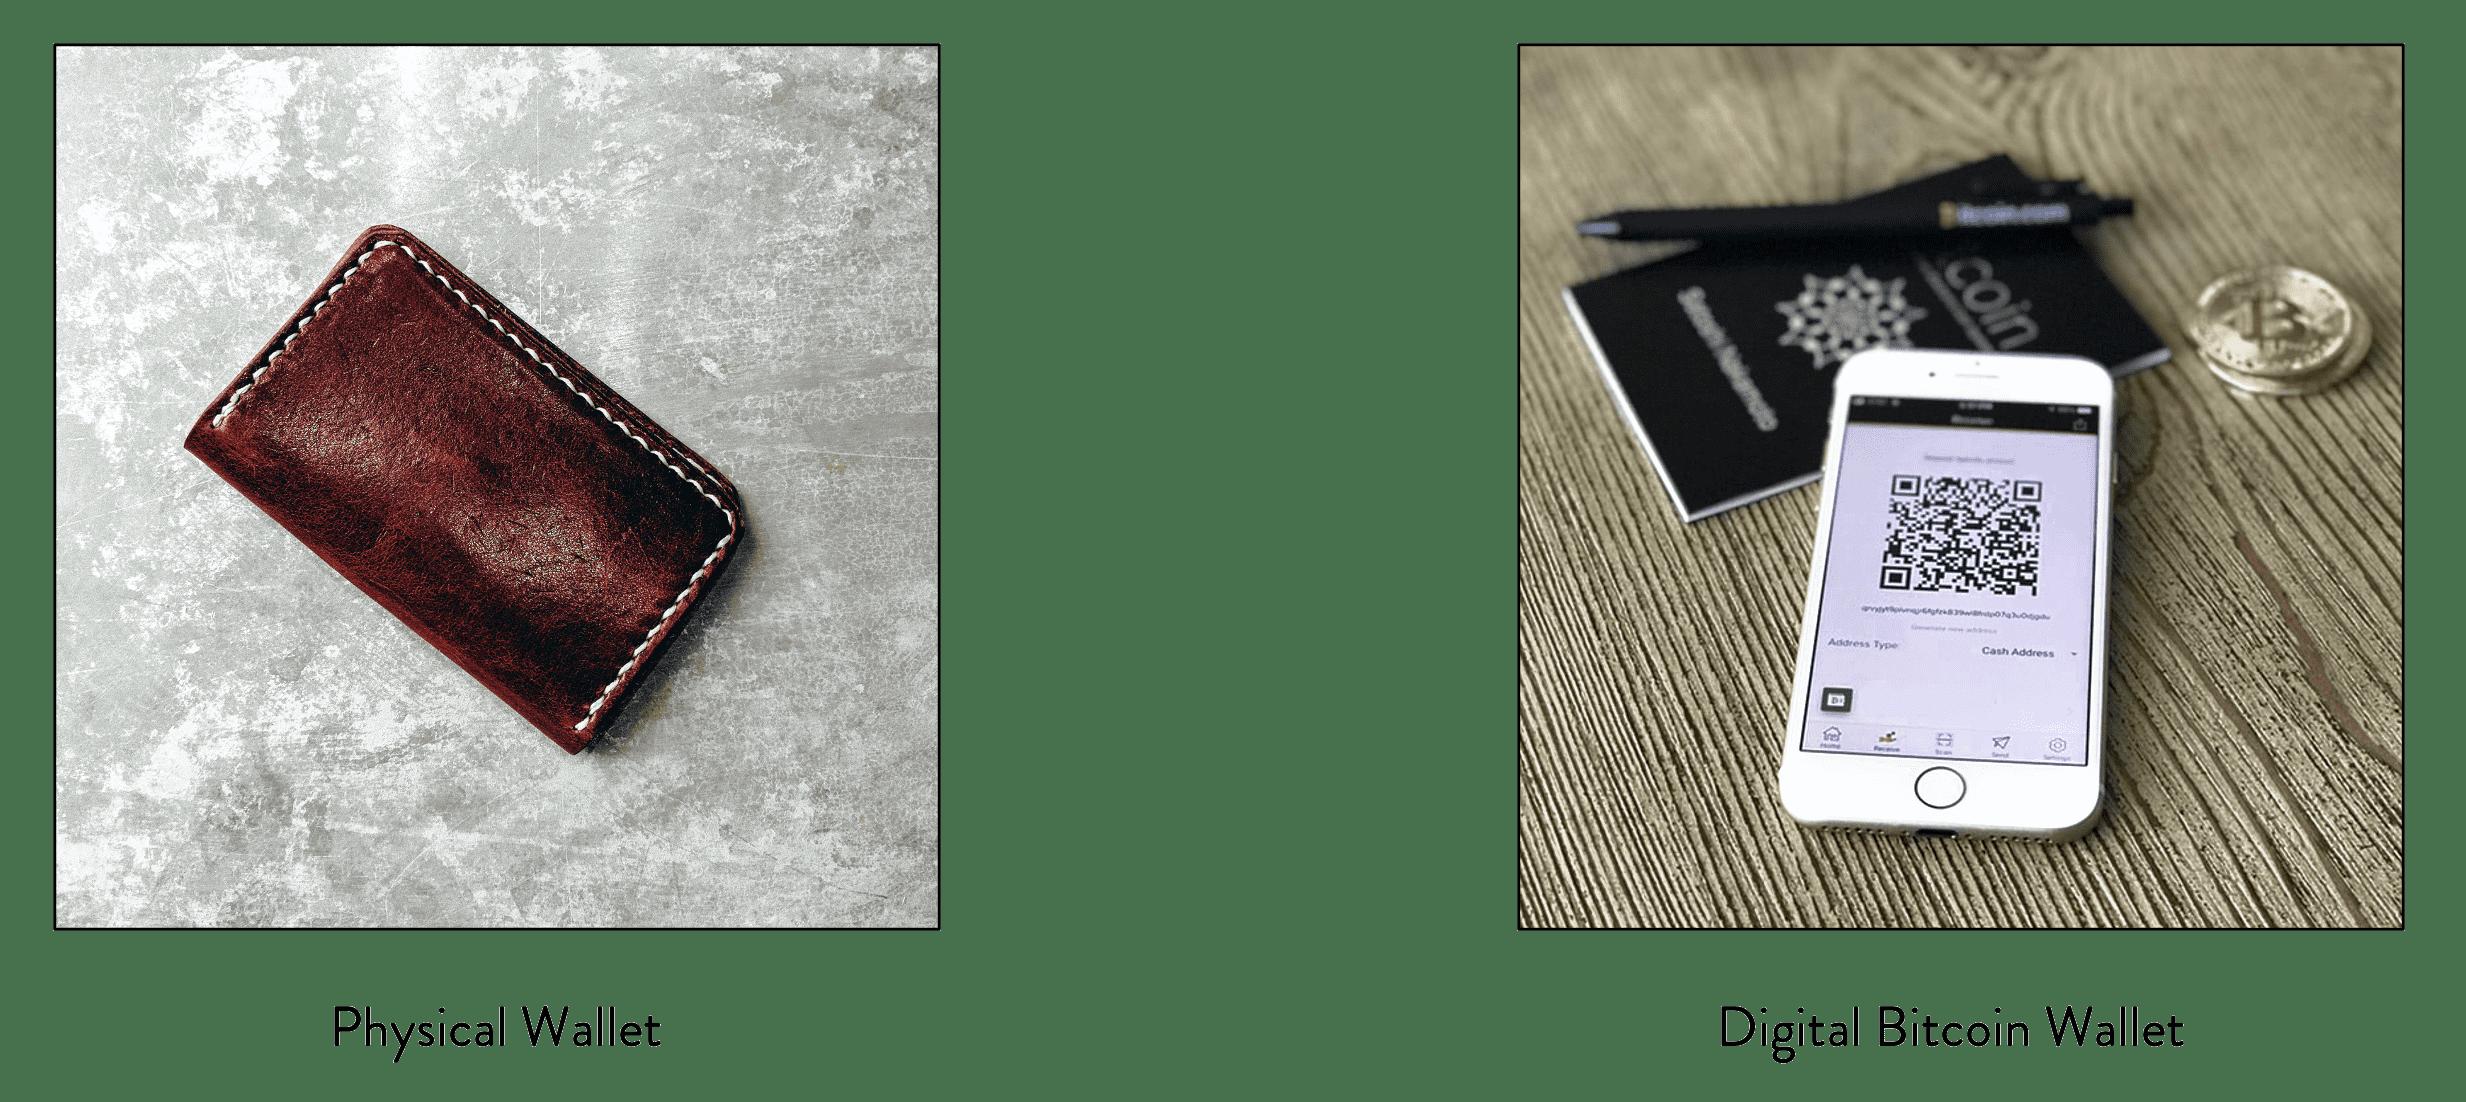 digital wallet physical wallet